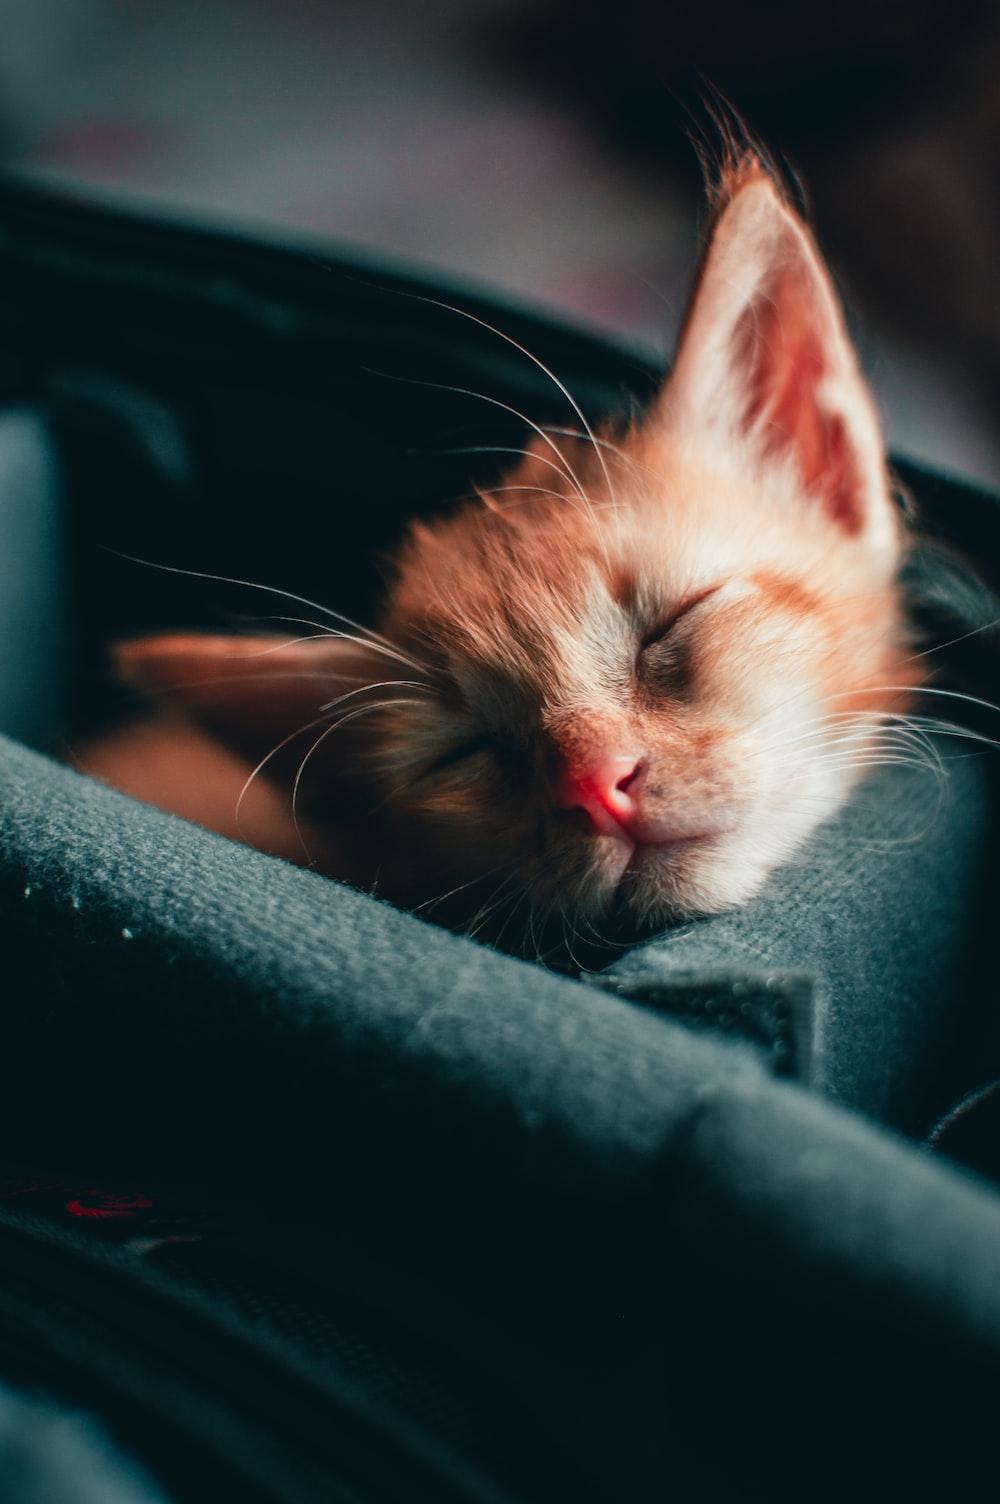 orange and white tabby kitten on black textile